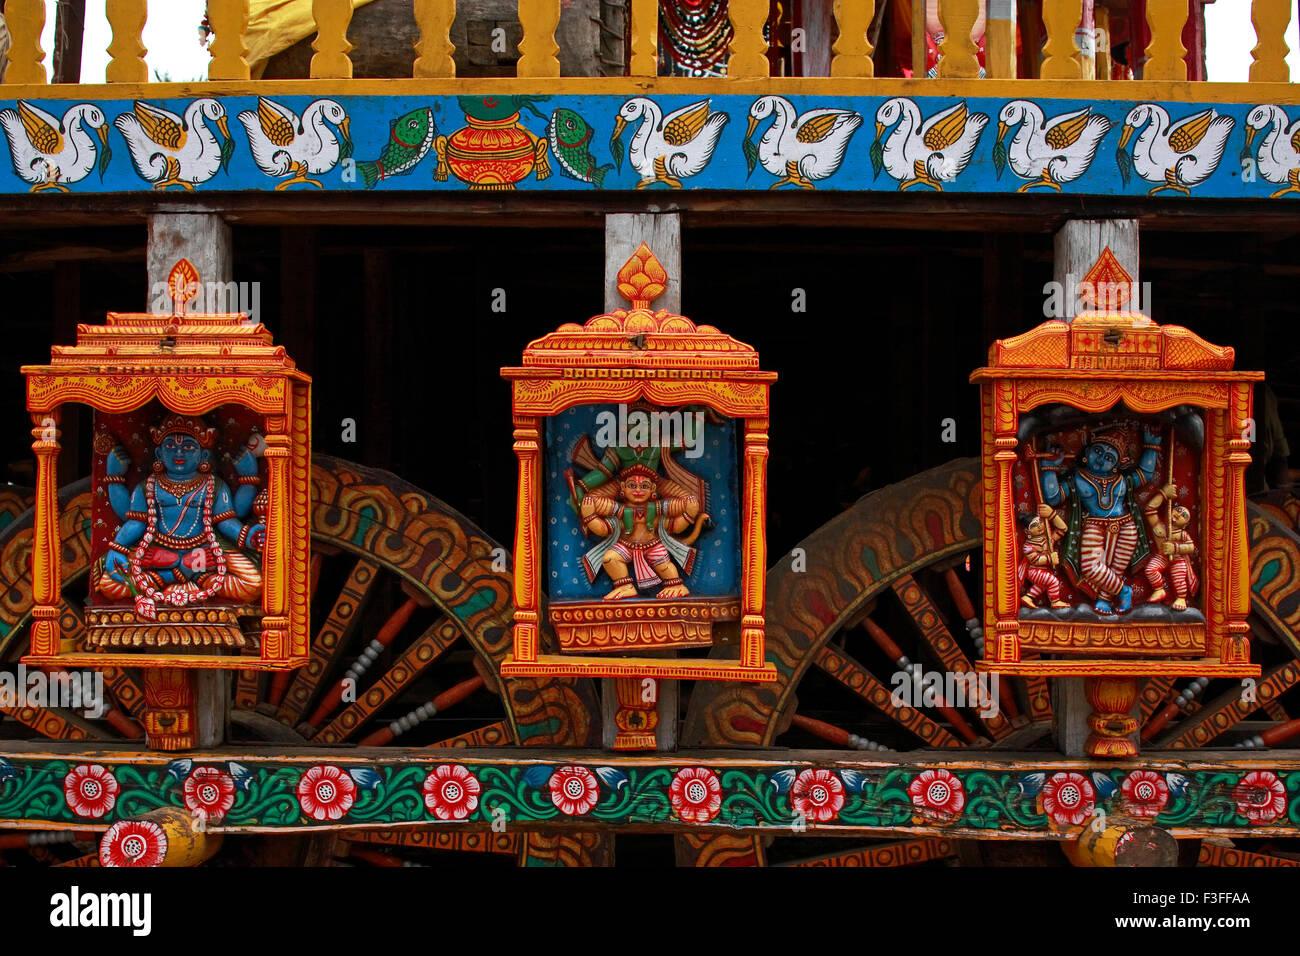 Gods statues on Rath yatra or Cart festival of Jagannath ; Puri ; Orissa ; India Stock Photo